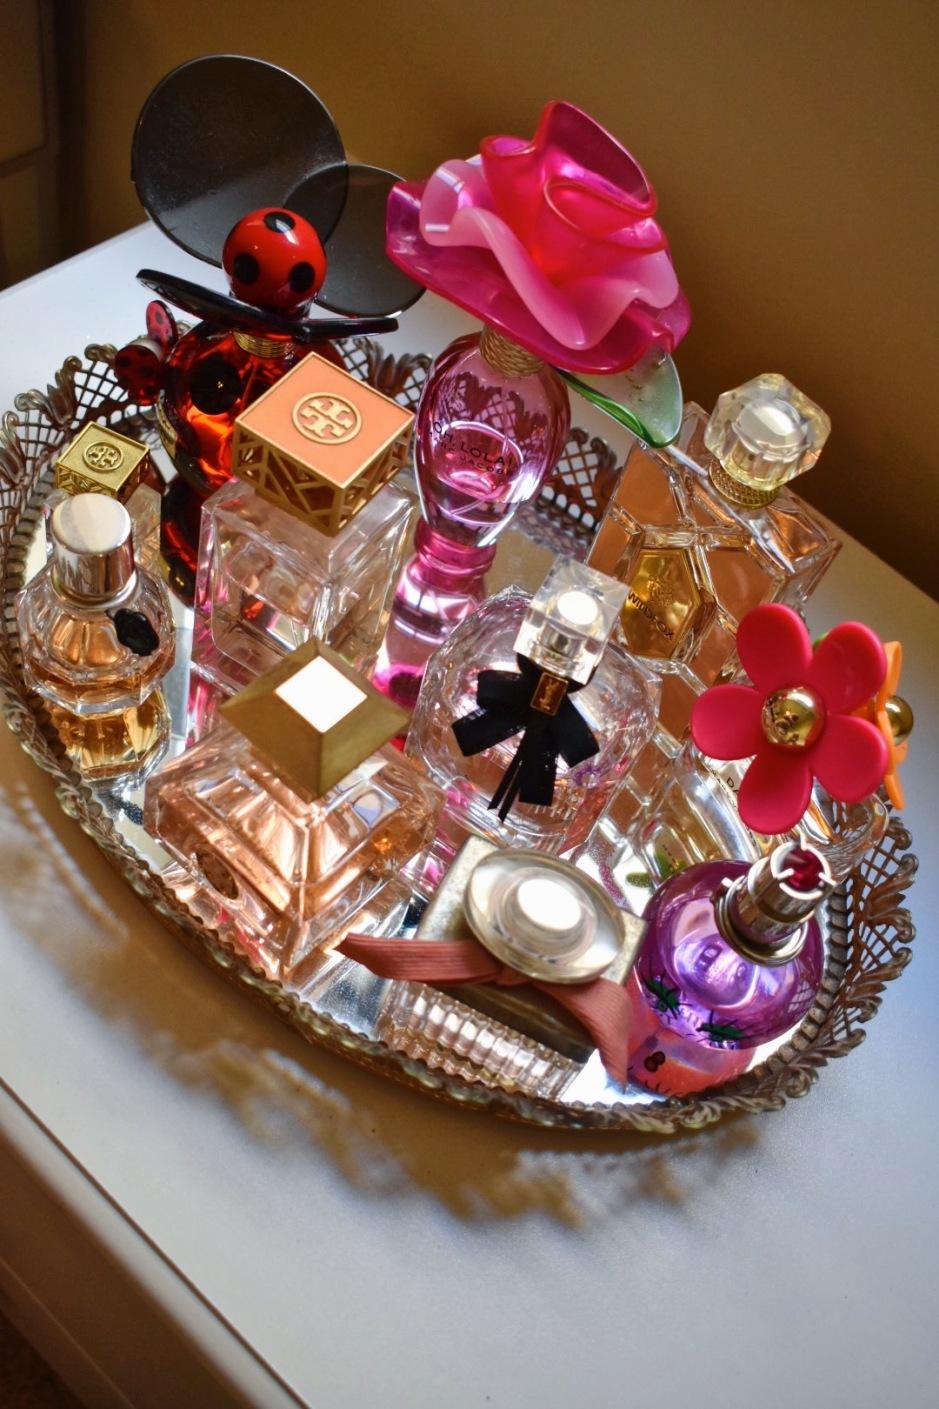 Flirty floral, vanilla, musky fragrance faviorites